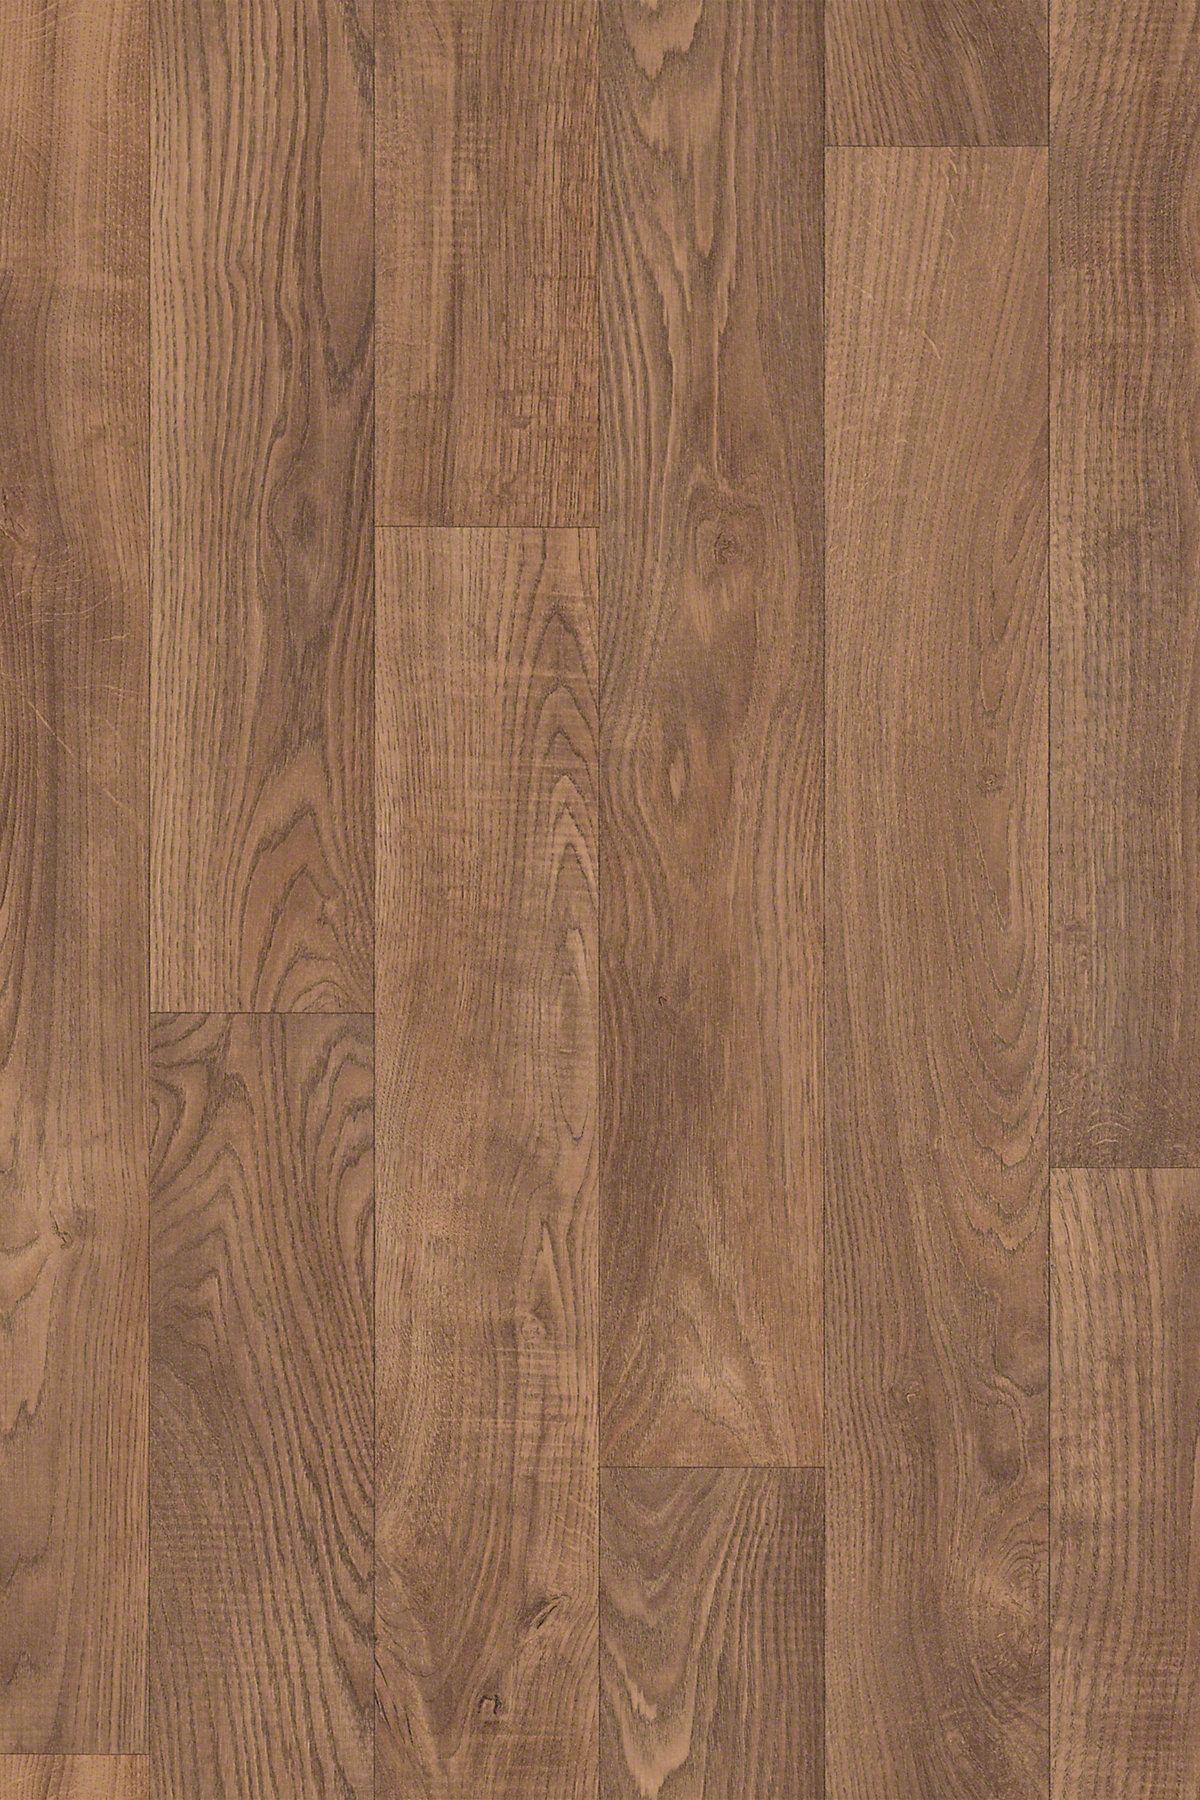 Provincial Madison Sa610 00202 Resilient Sample En 2020 Pisos Textura Madera Textura Textura